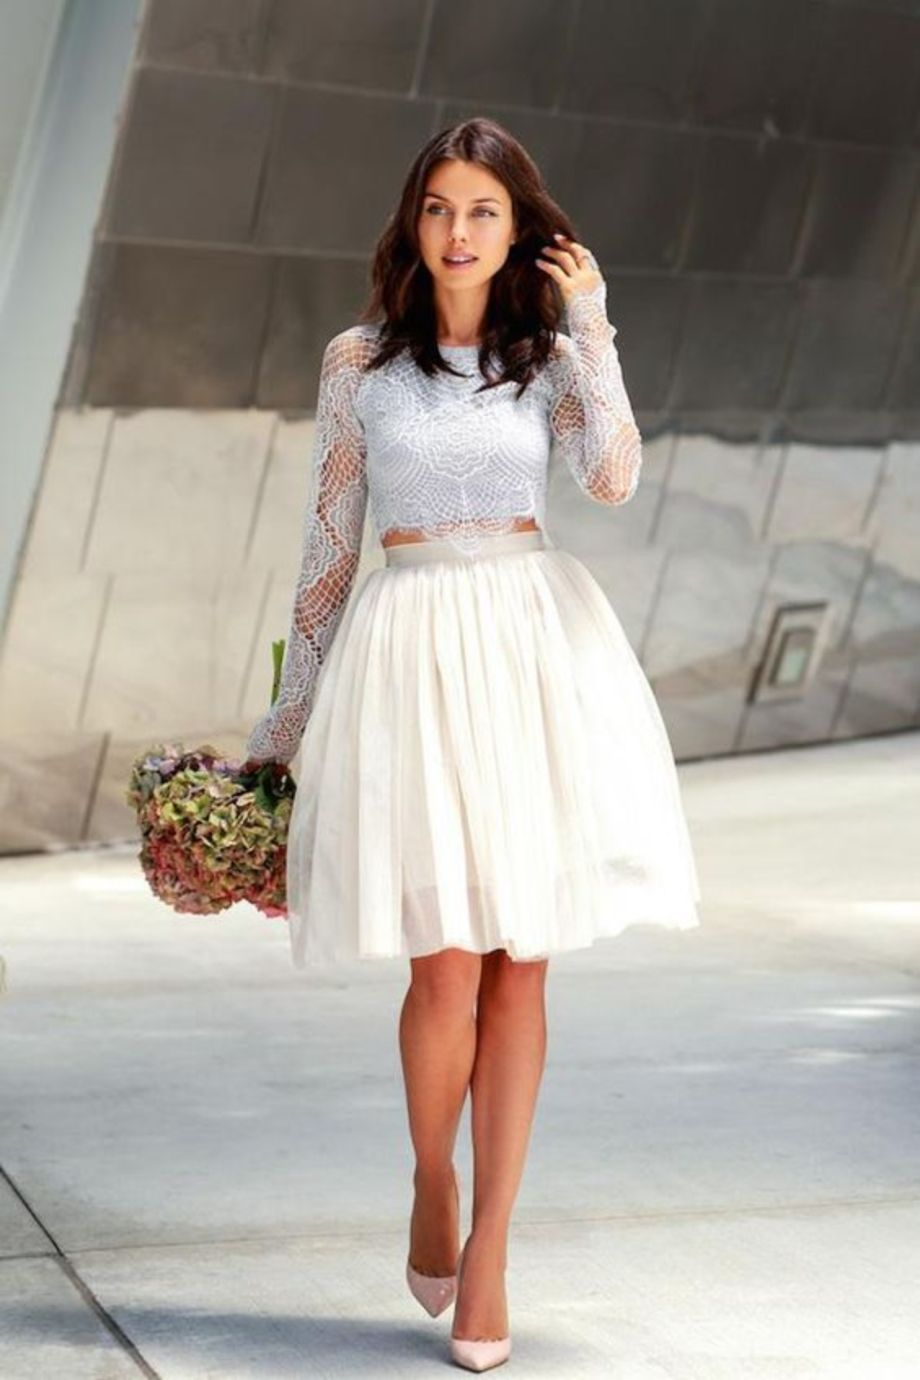 Stylish Courthouse Wedding Dress Ideas My dream wedding